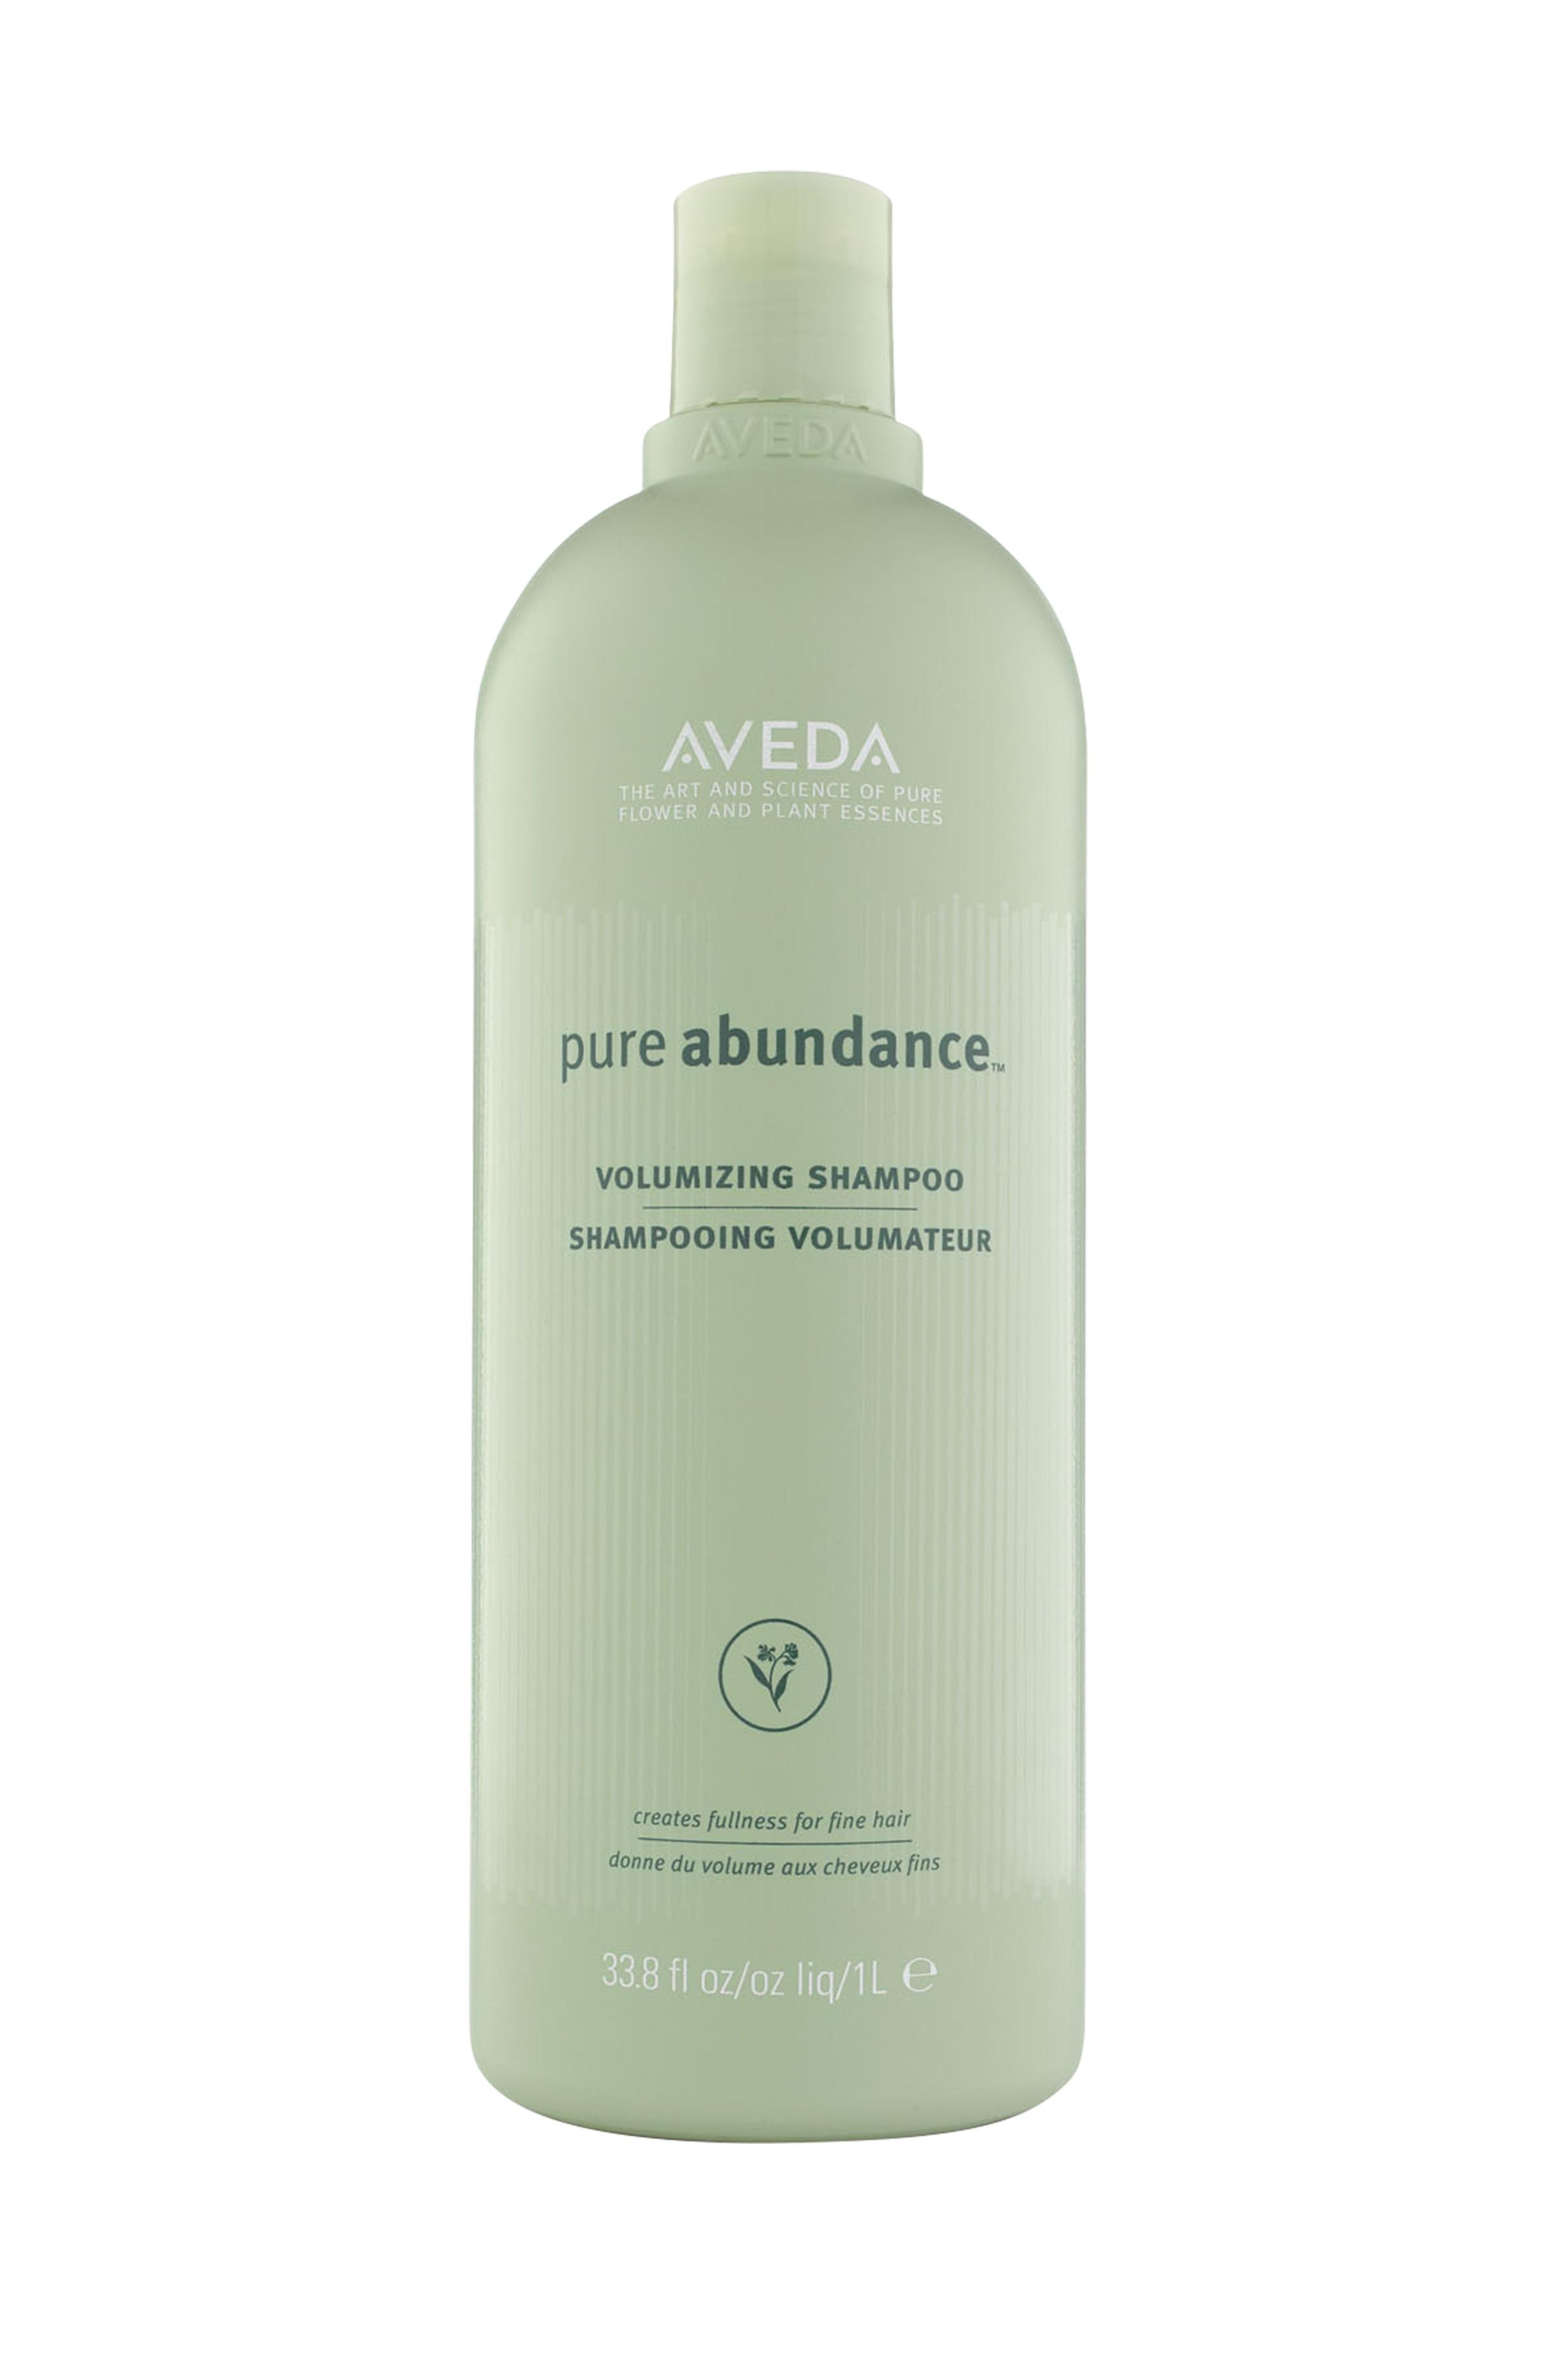 Aveda pure abundance shampoo volumizzante 1000 ml, Verde, large image number 0